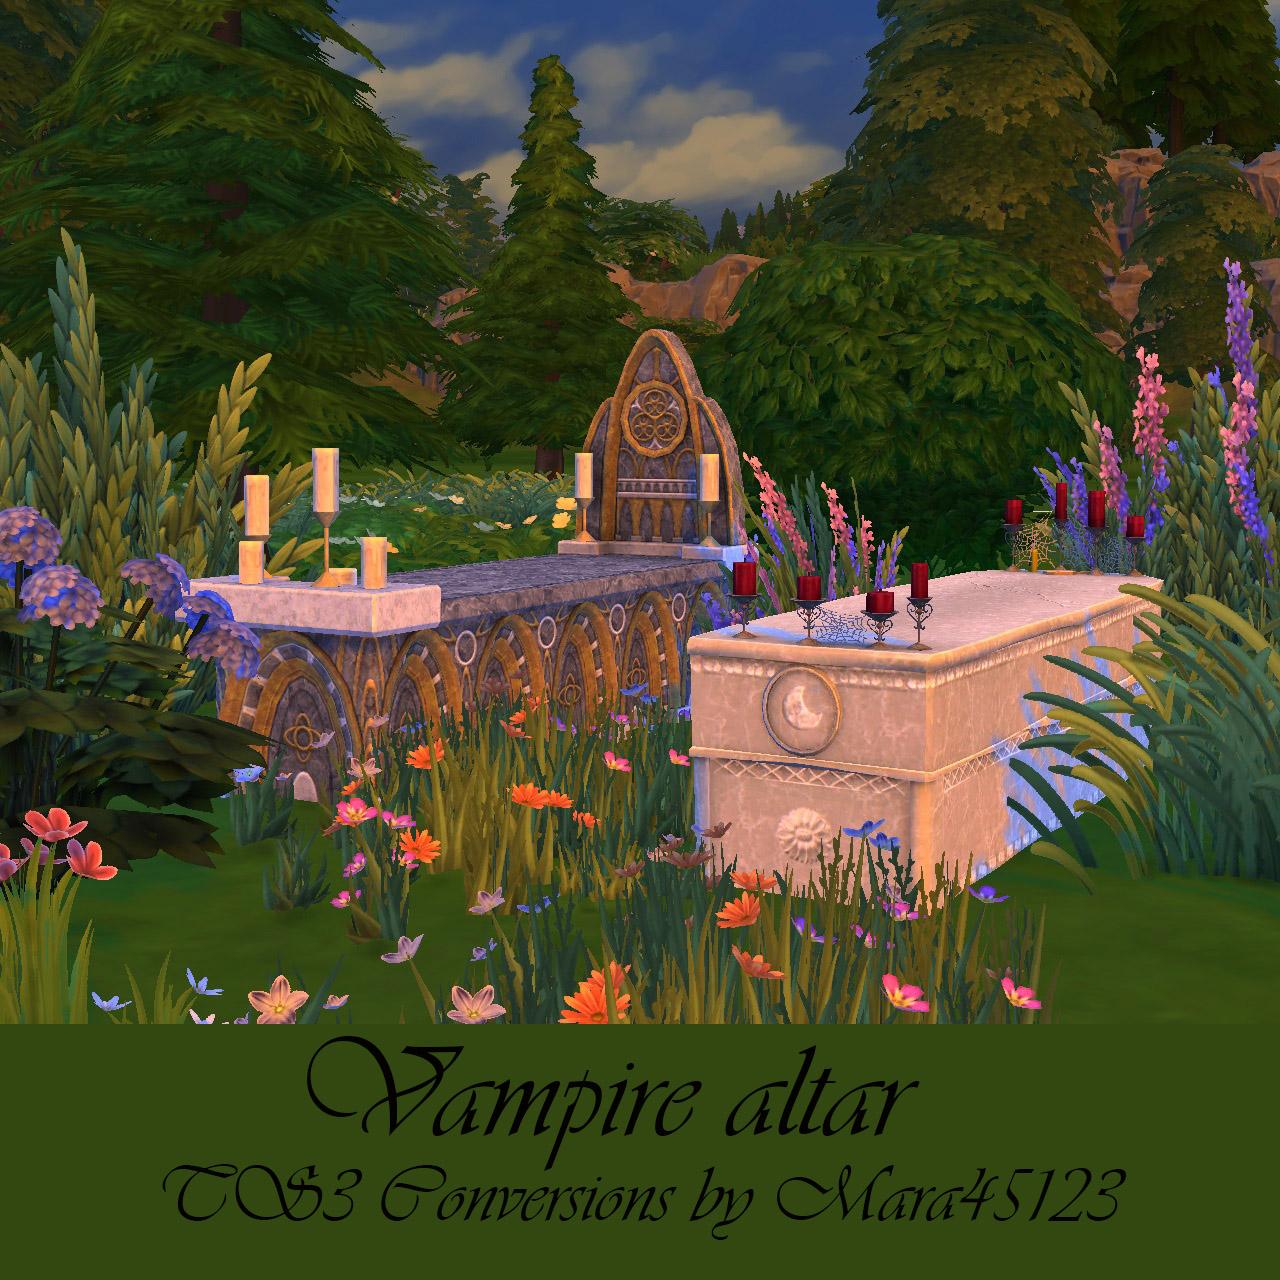 Wedding Altar In Sims 3: My Sims 4 Blog: TS3 Vampire Altar Conversions By Mara45123